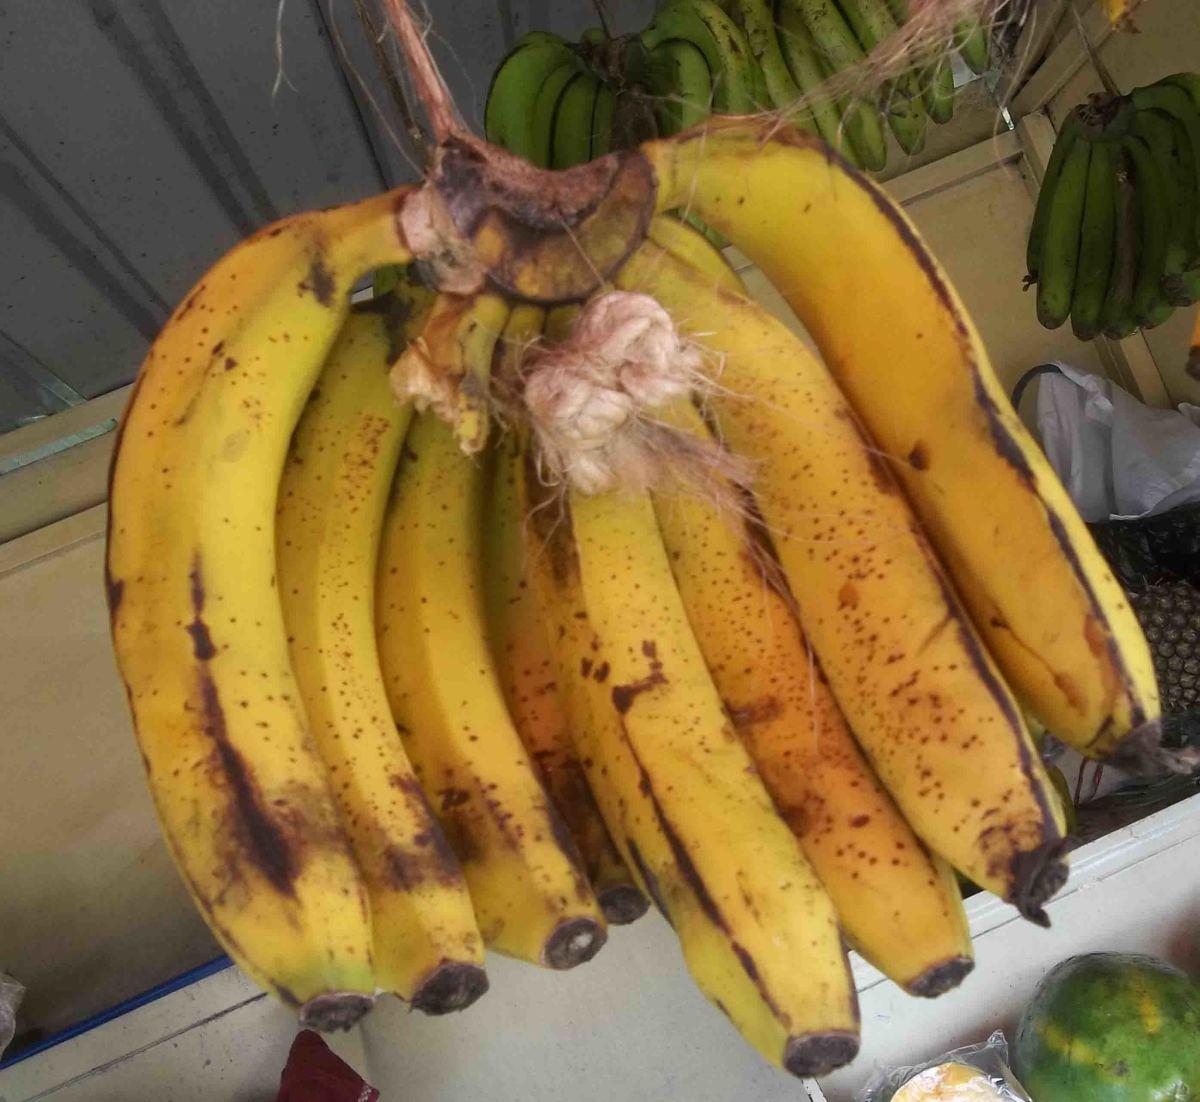 Gatumia (or Nyoro) - has the shortest tree.  Prefered as a ripe fruit